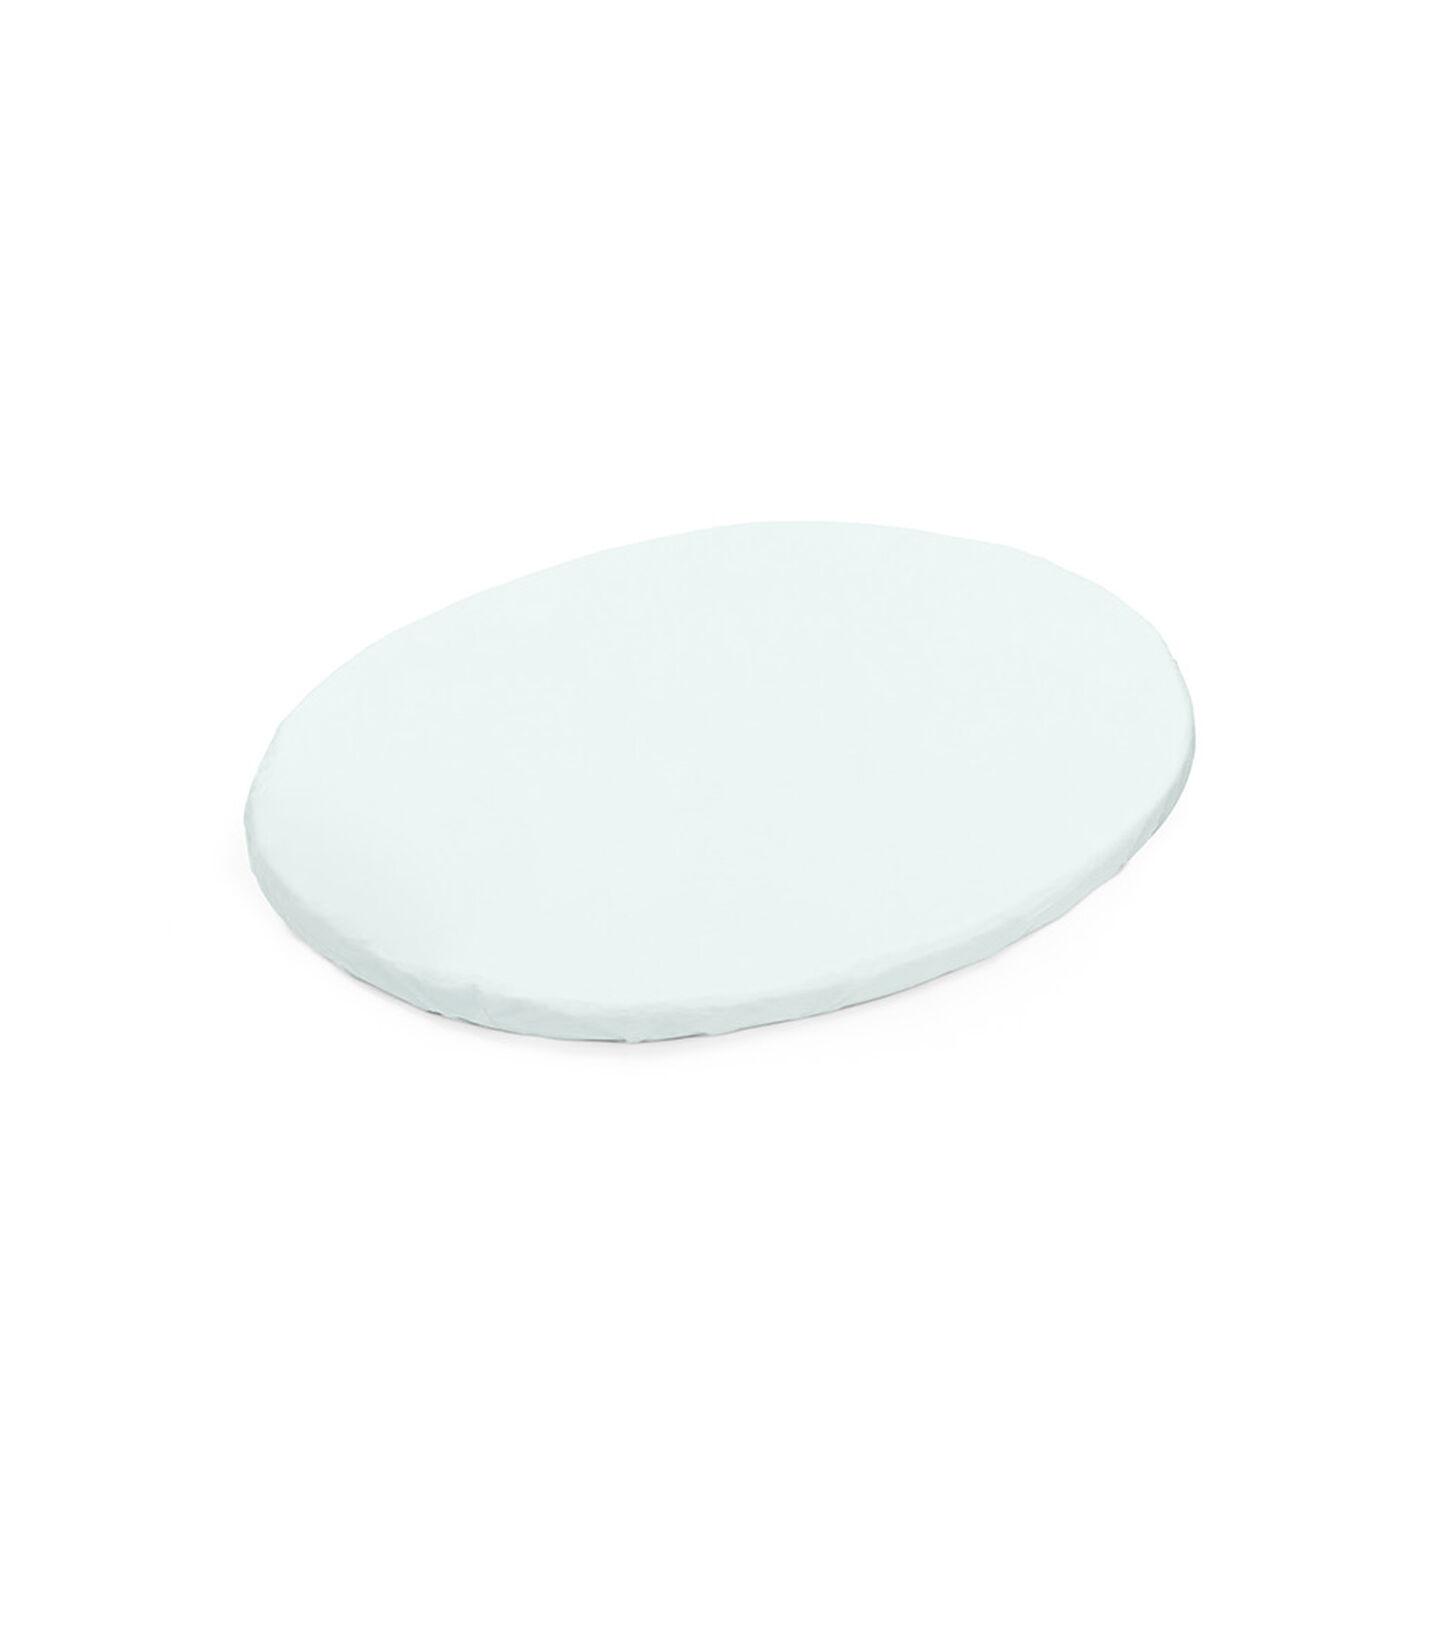 Stokke® Sleepi™ Mini Fitted Sheet Powder Blue, Powder Blue, mainview view 1